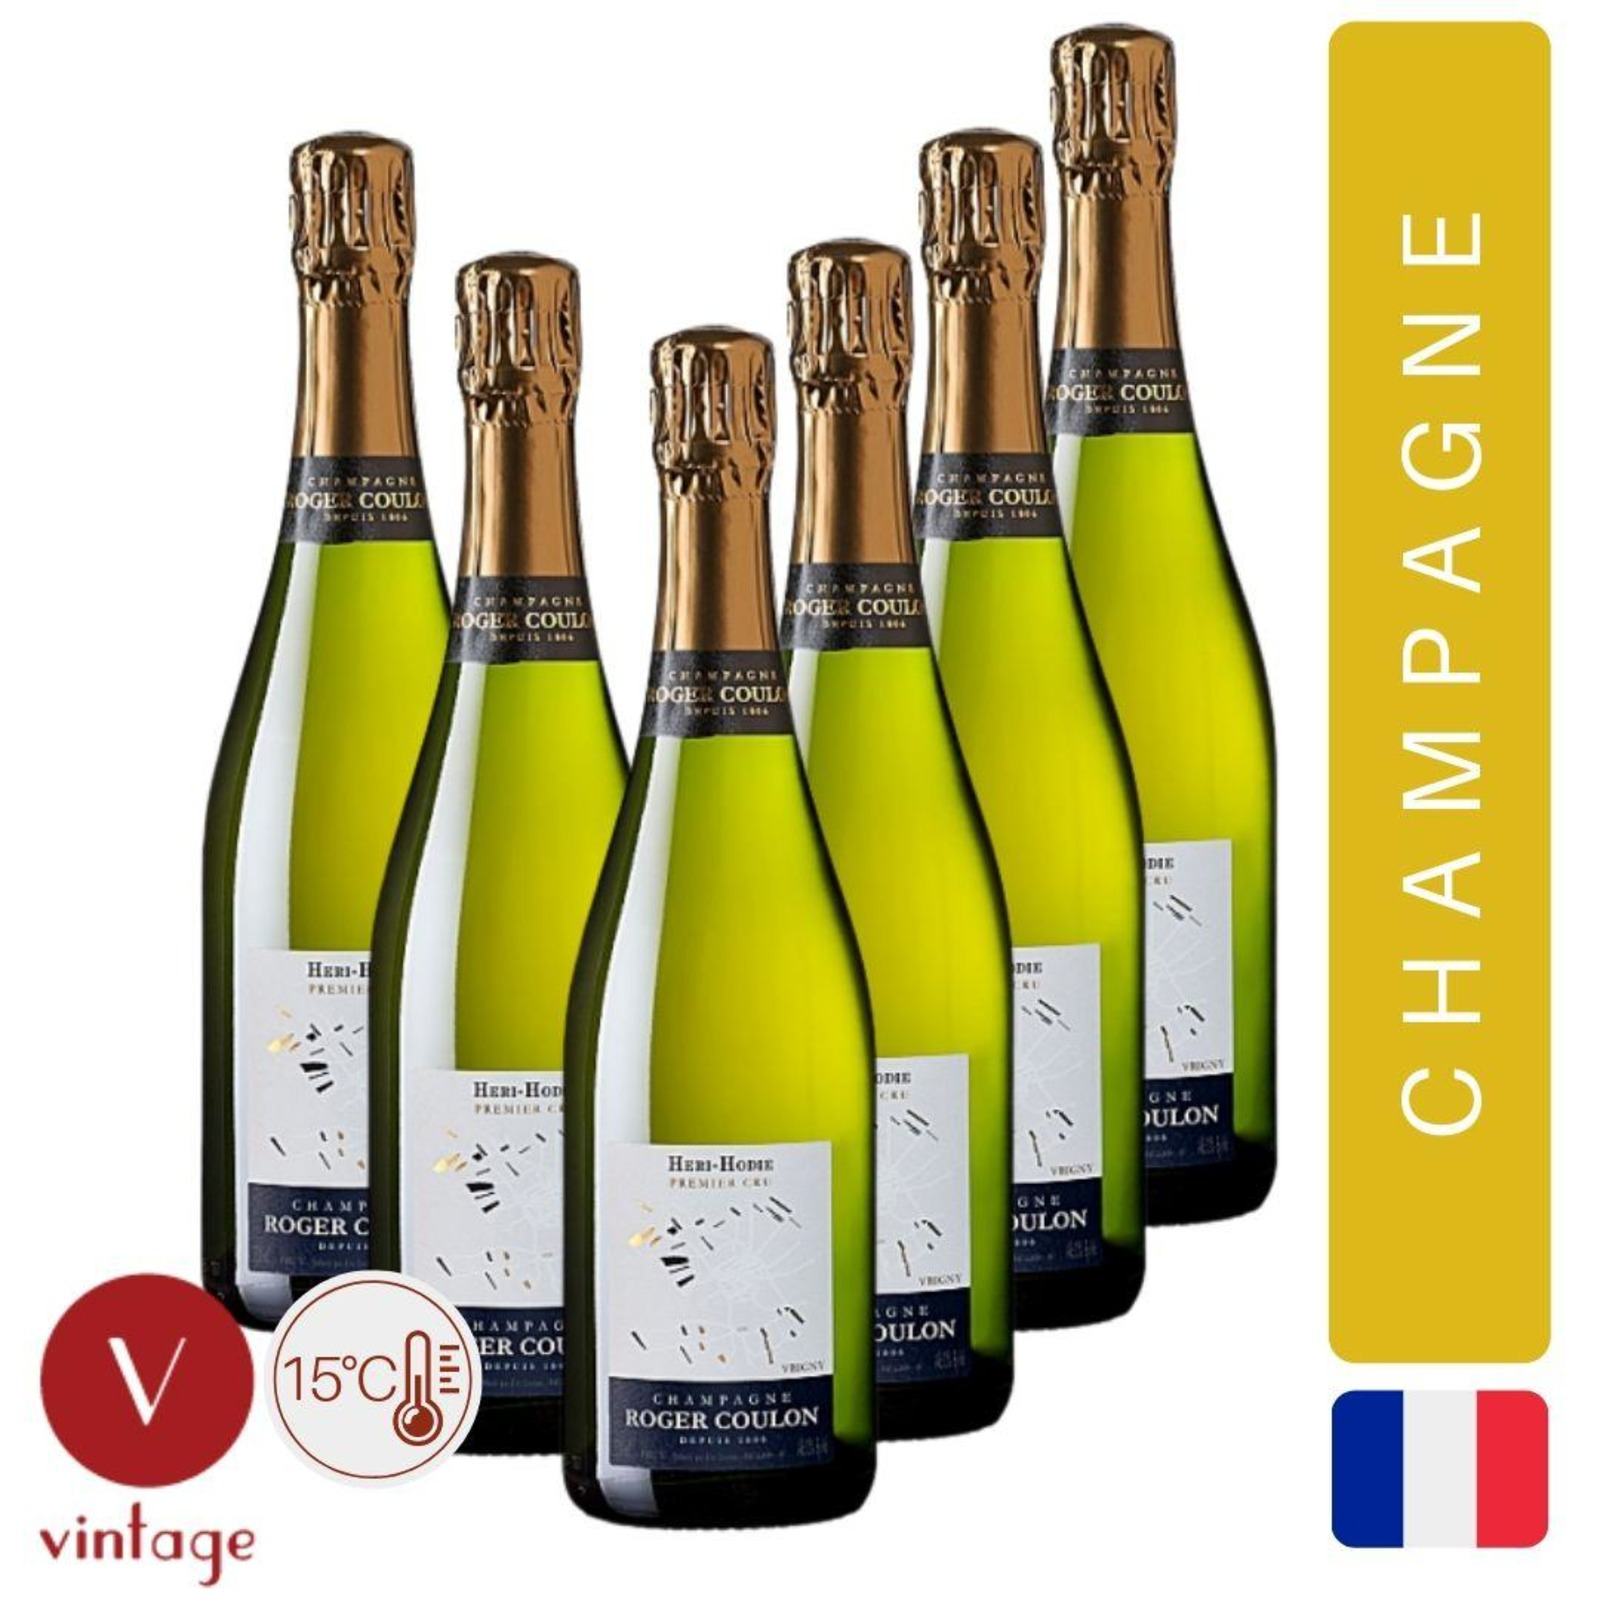 Champagne Roger Coulon - Cuvee Heri-Hodie 1er Cru